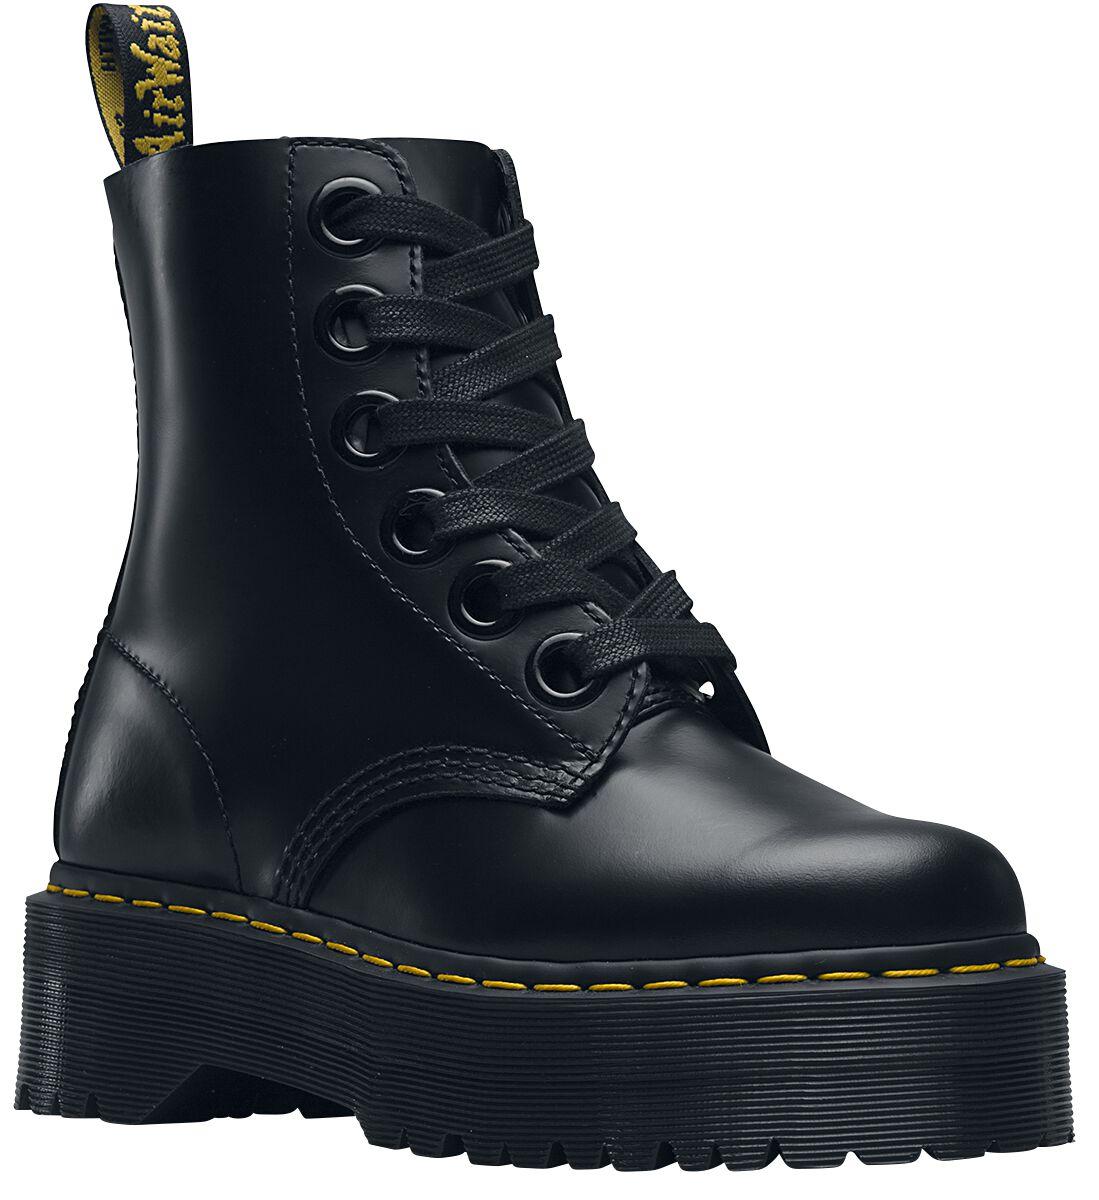 Dr. Martens Molly Buttero Boot schwarz 24861001 black